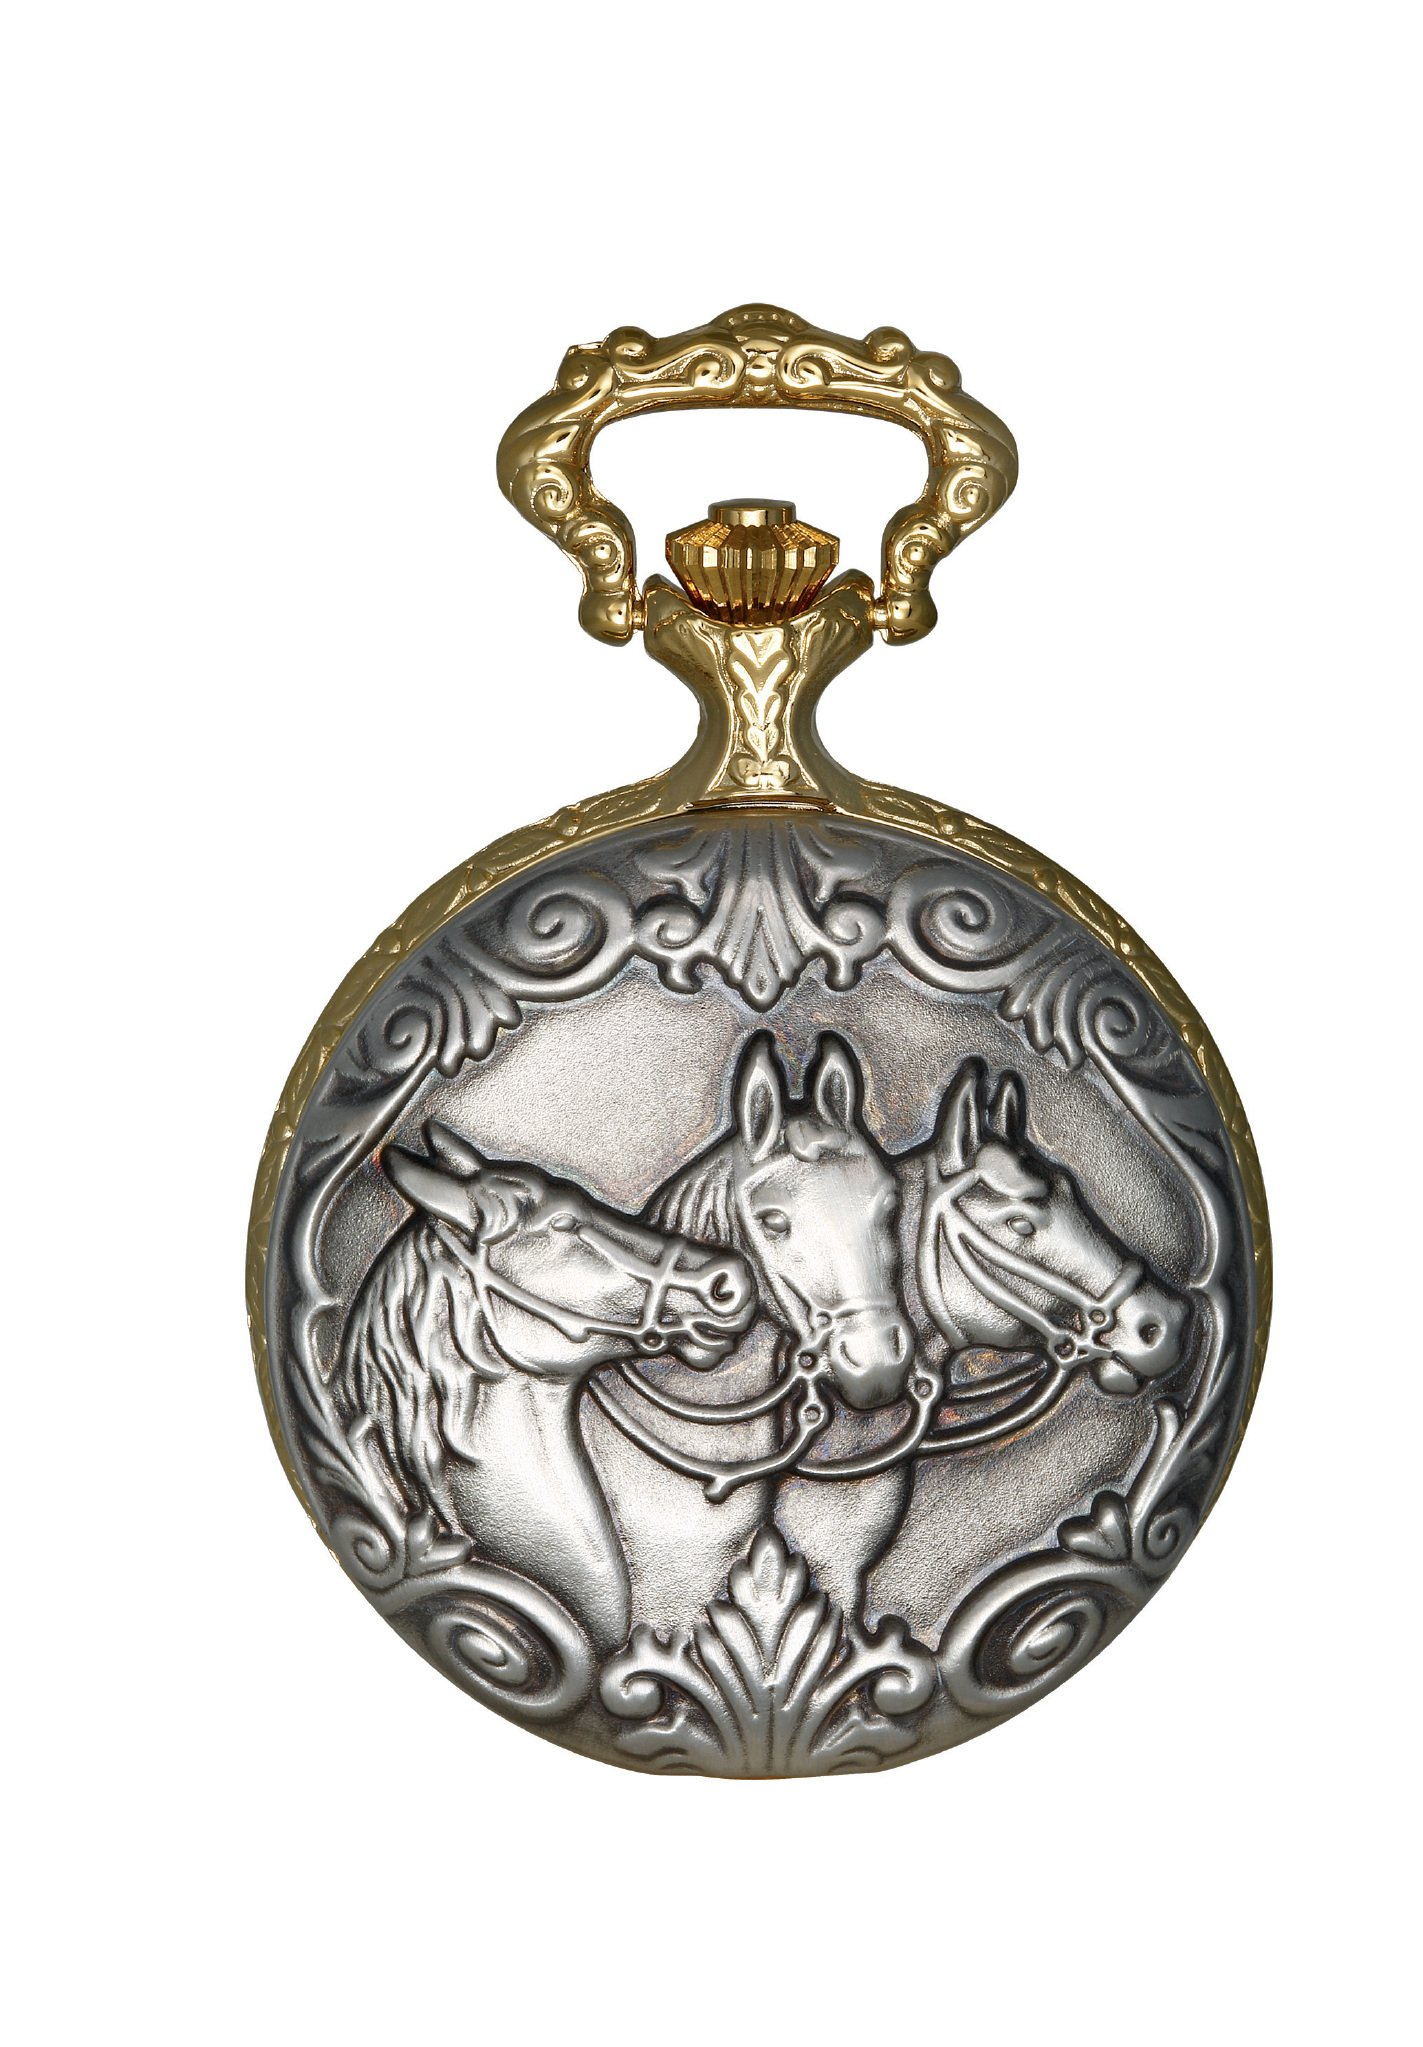 Charles-Hubert, Paris DWA040 Classic Collection Analog Display Japanese Quartz Pocket Watch